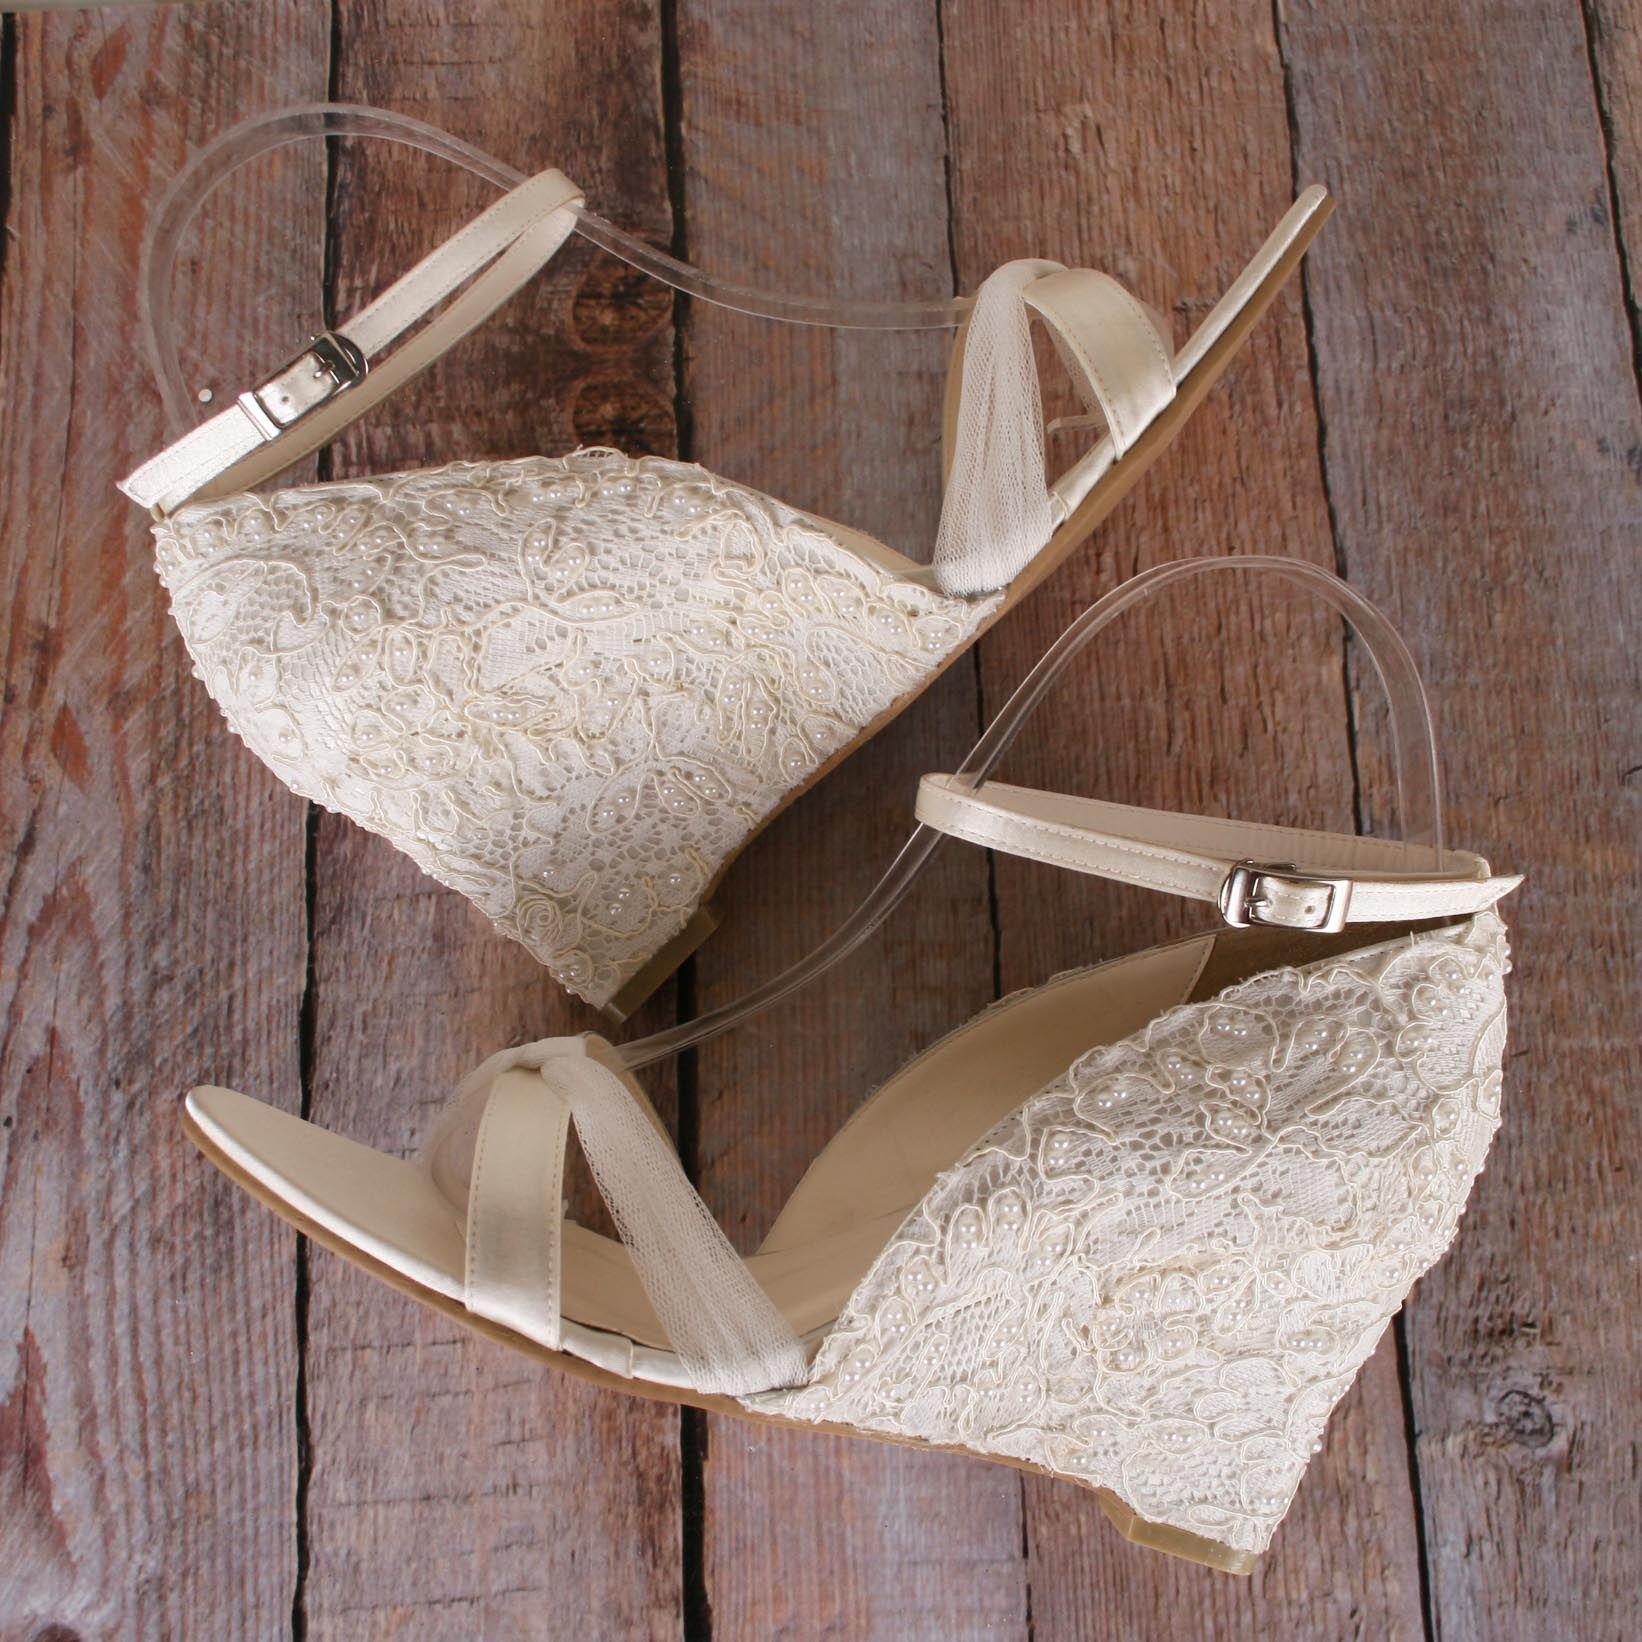 Ivory Wedges, Lace Wedding Shoes, Lace Wedges, Ivory Lace Shoes, Lace  Wedding